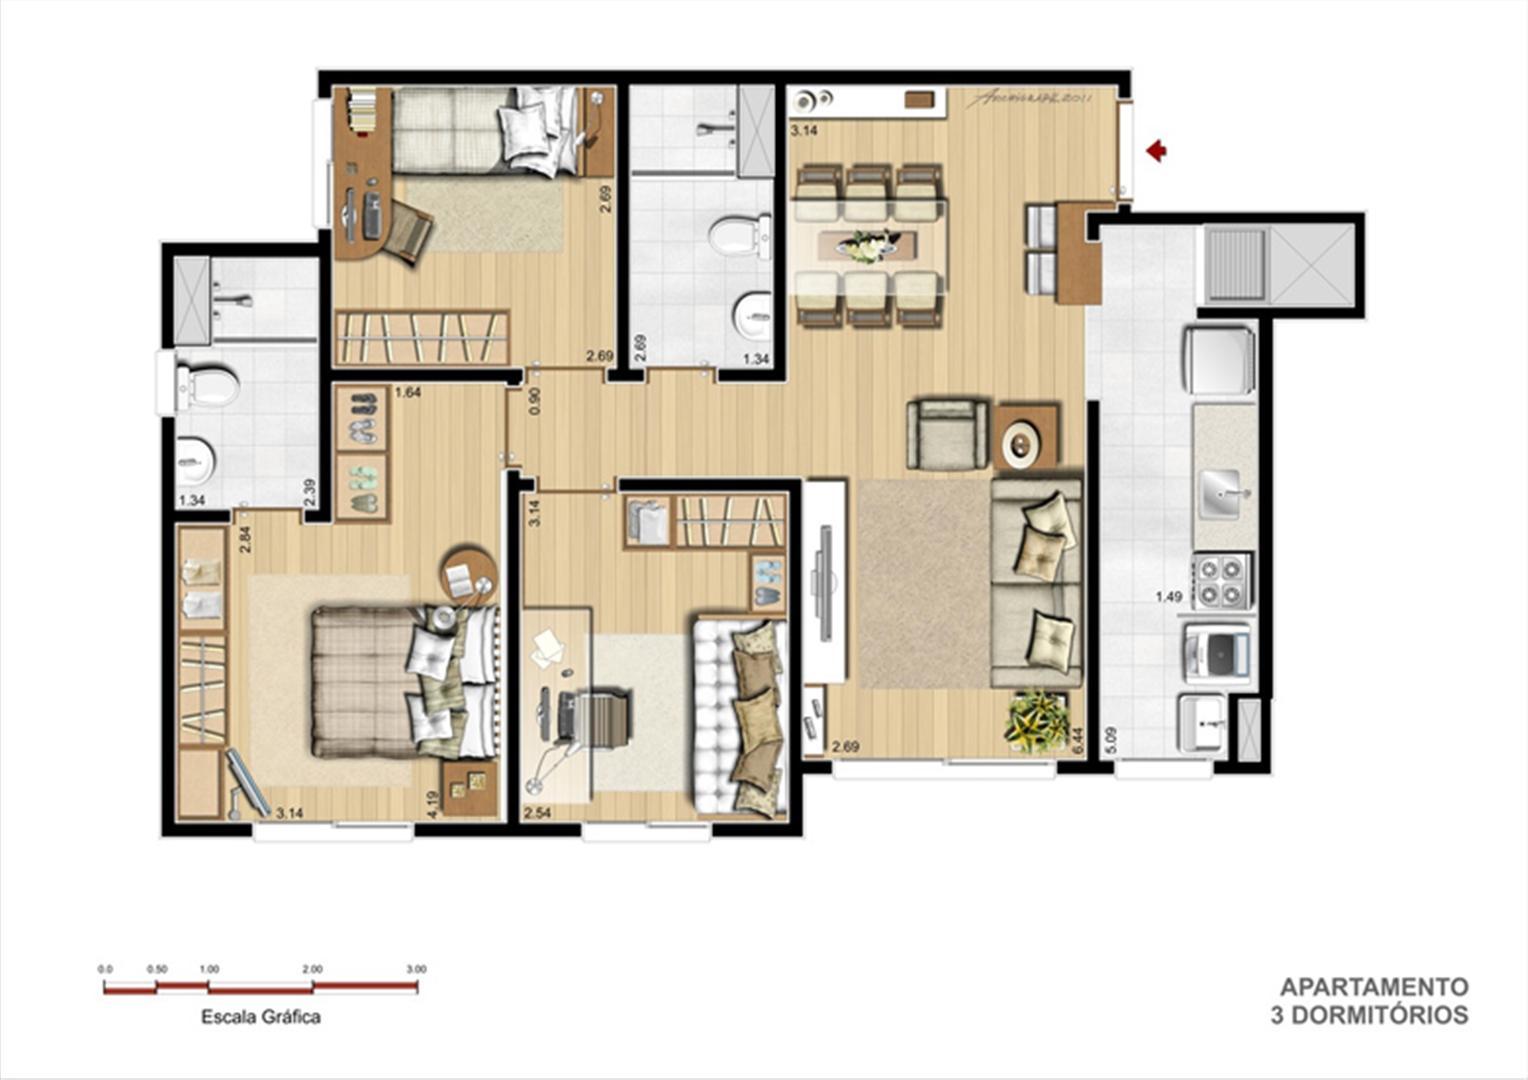 Tipo 3 dormitórios | Supera Condomínio Clube – Apartamento  próximo ao Zaffari Zona Sul - Porto Alegre - Rio Grande do Sul